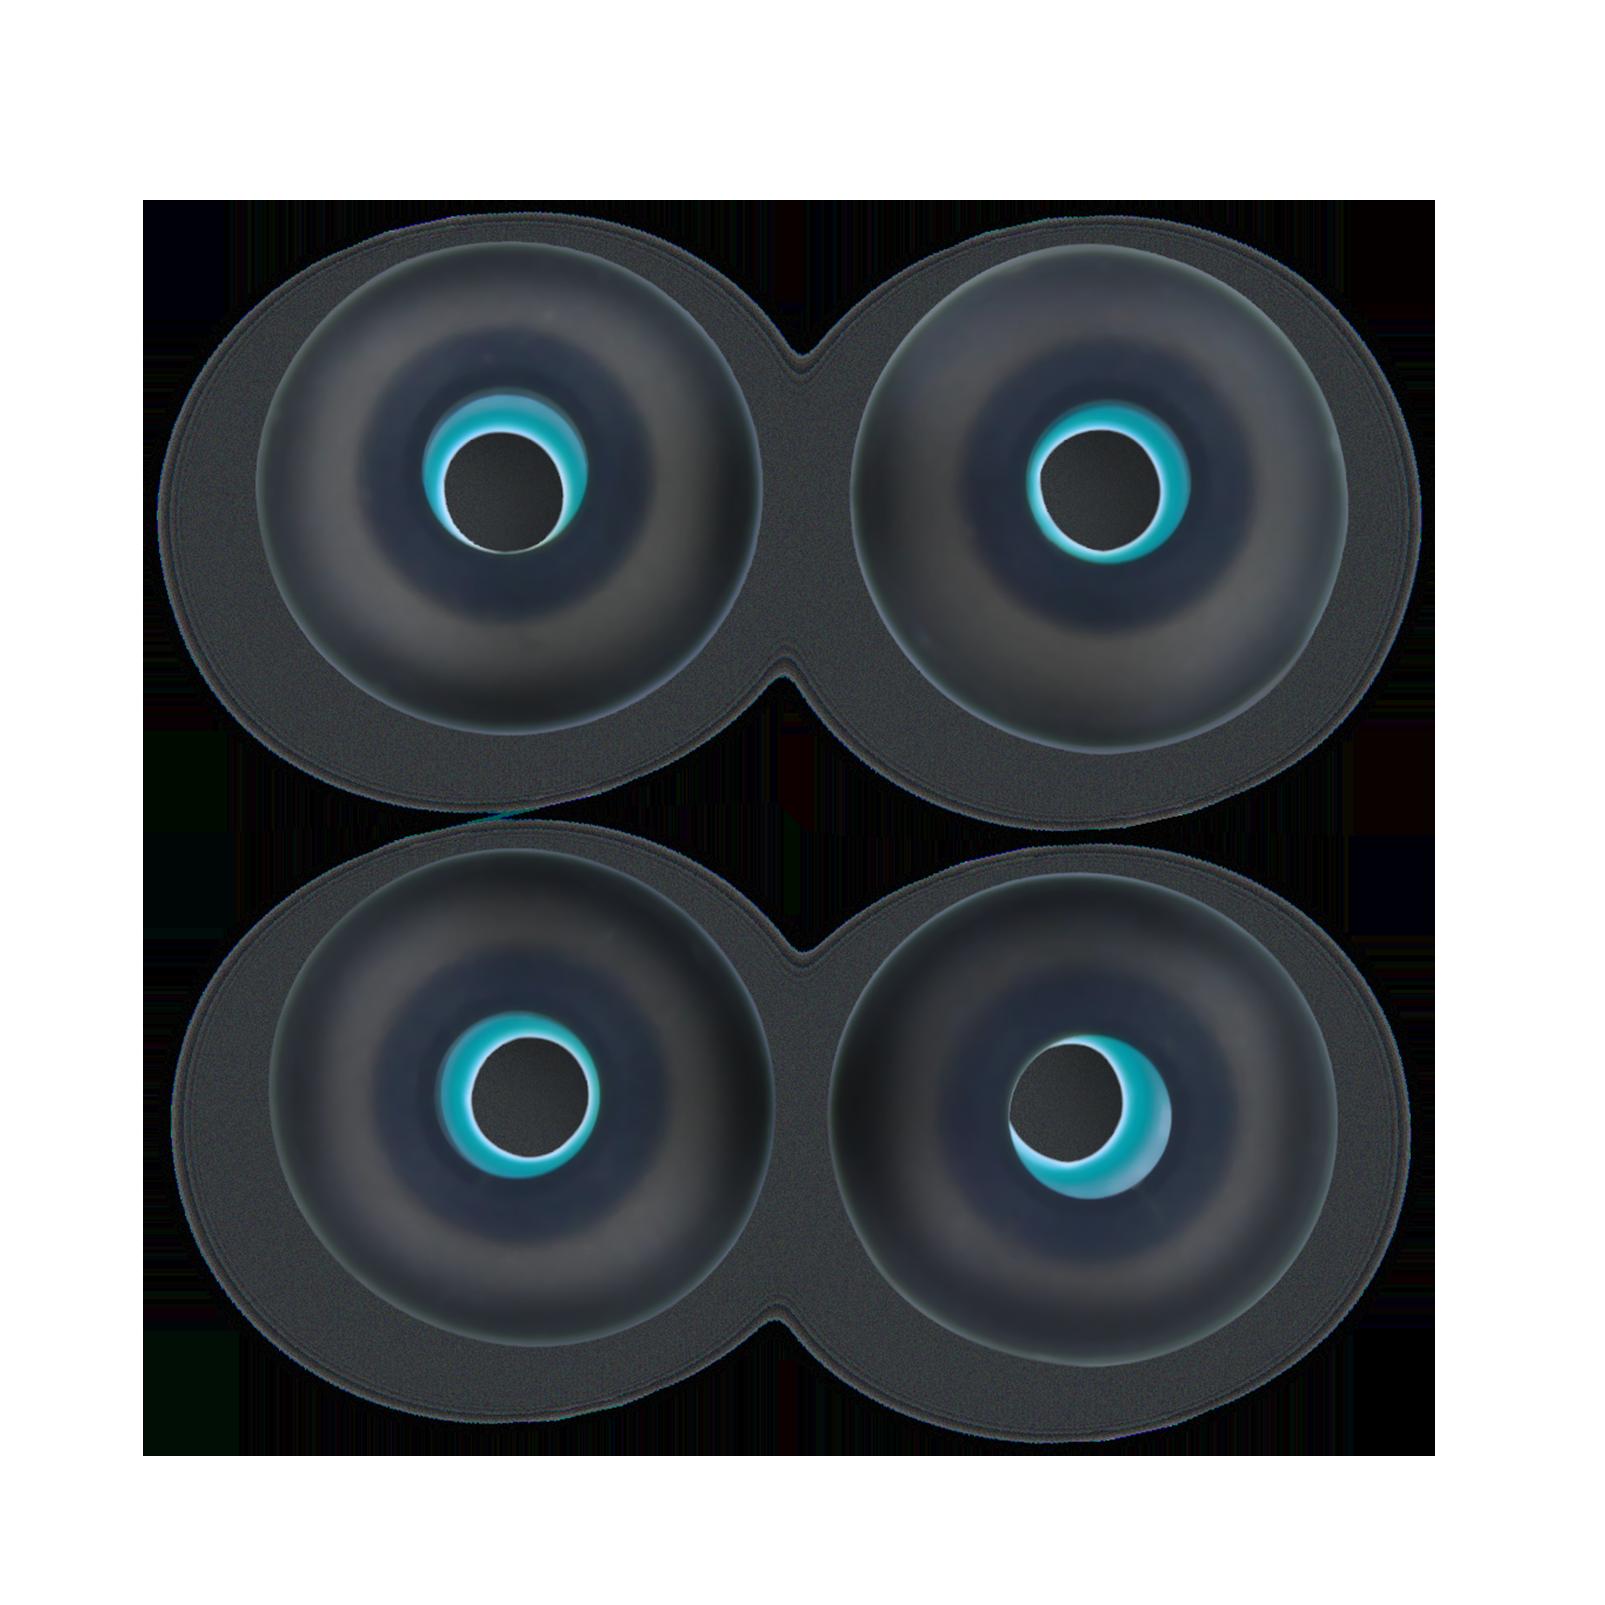 Ear tips set (2pair) for N20NC - Black - Ear tips M (2 pair) - Hero